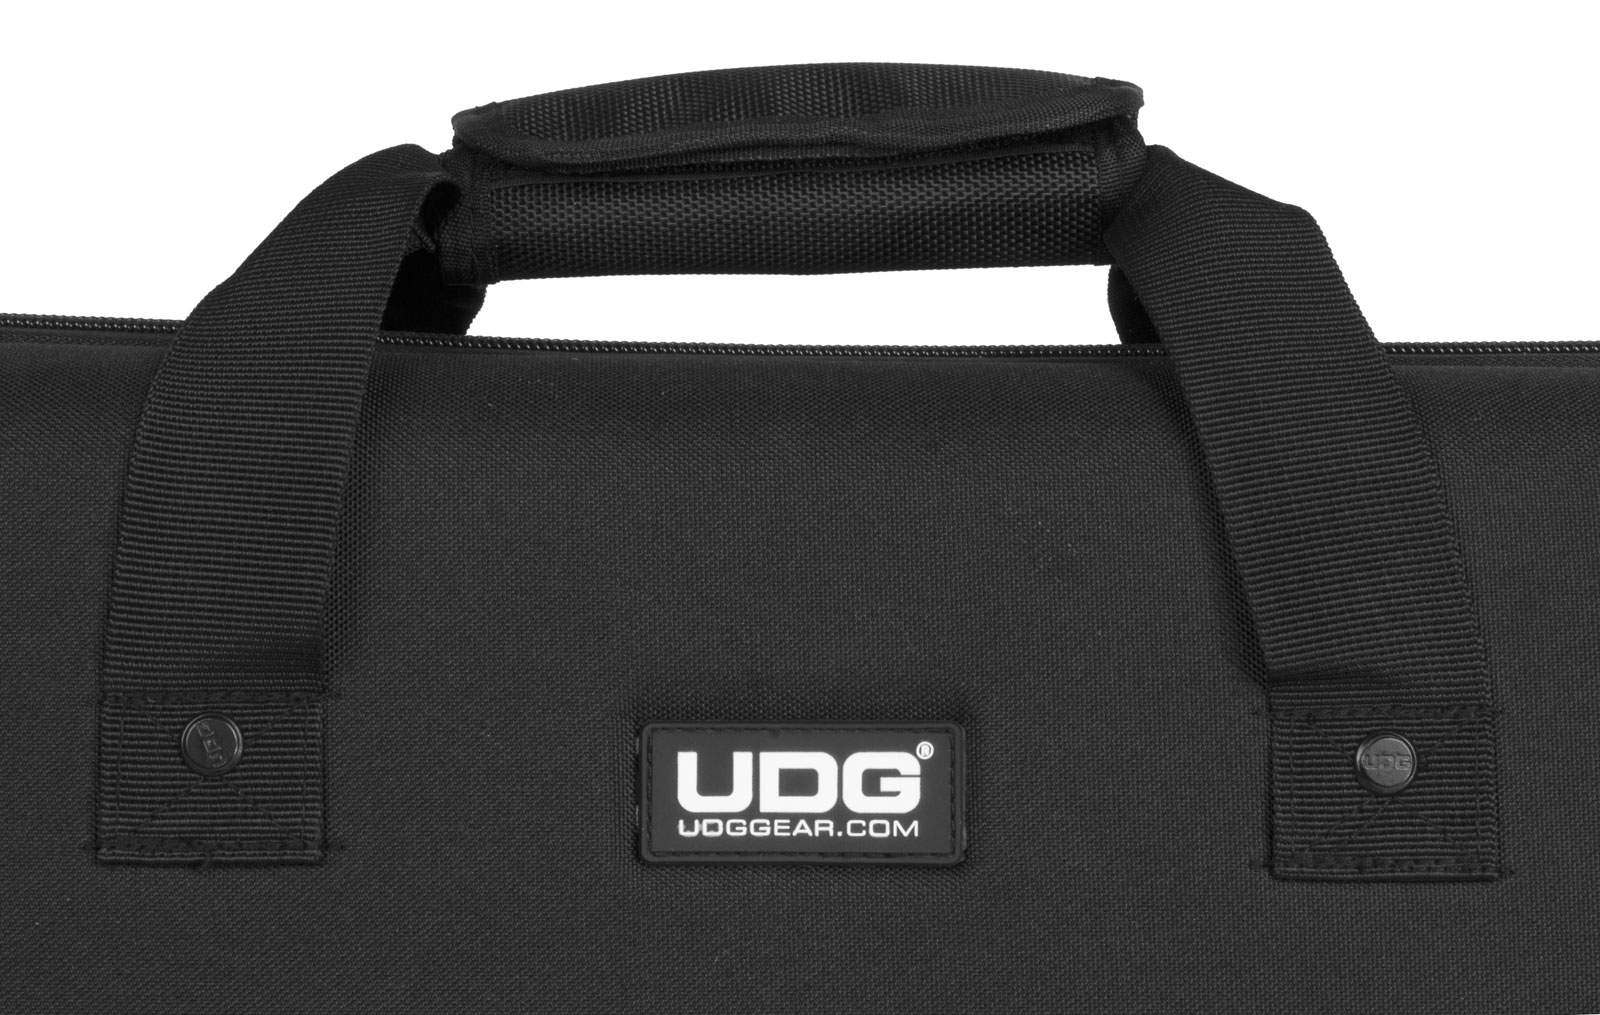 UDG U 8301 BL - Woodbrass.com